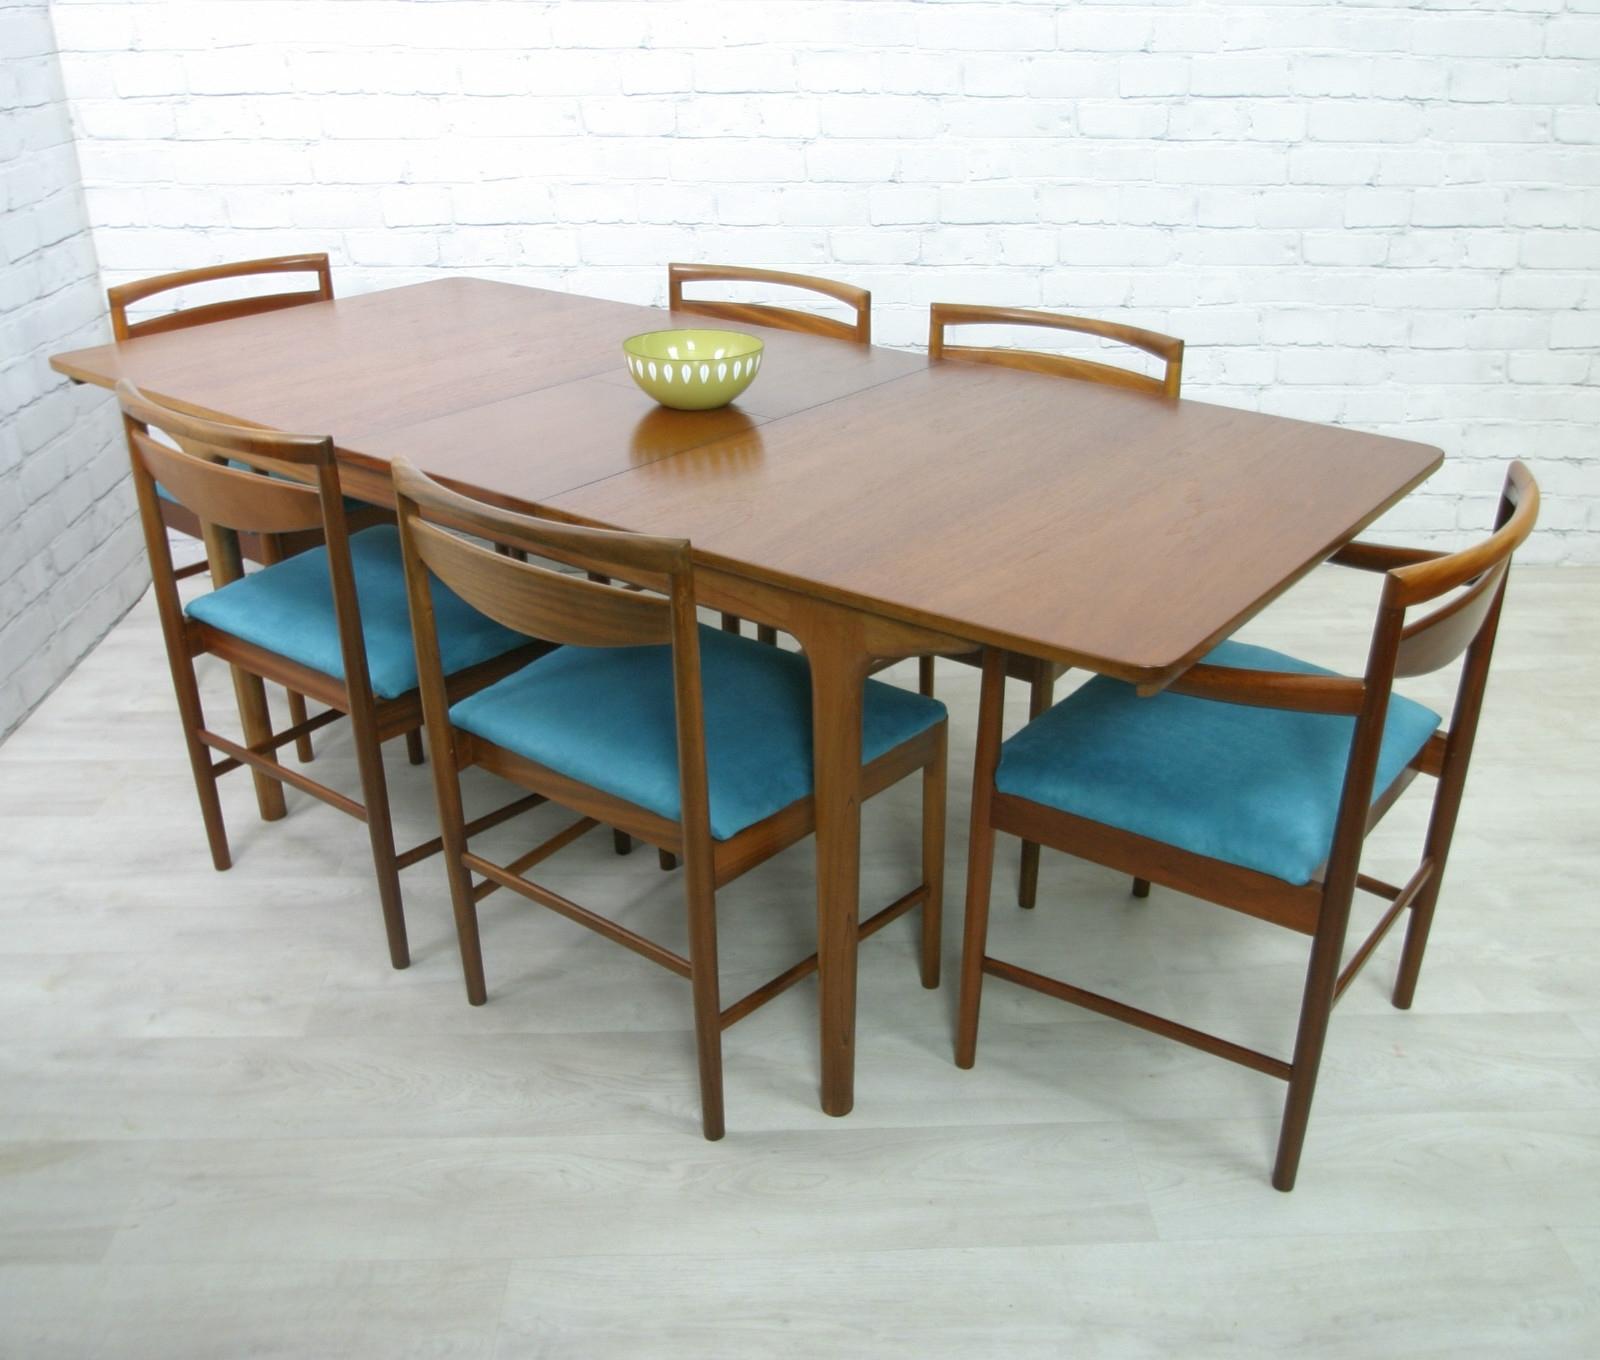 Danish Style Dining Tables regarding Most Popular This Is My Meemee's Dining Table. Mcintosh Retro Vintage Teak Mid